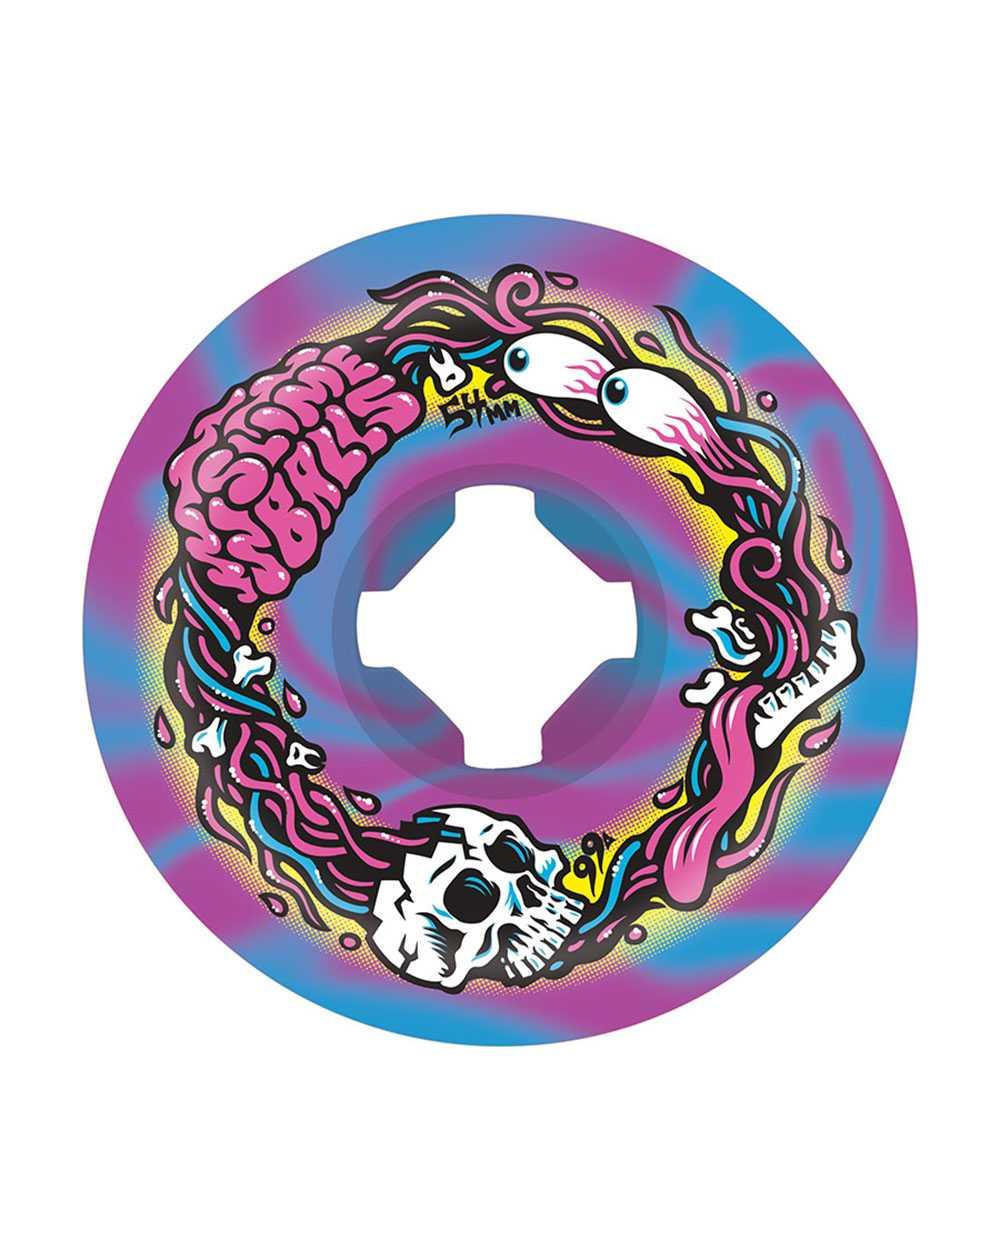 Slime Balls Brains Speed Balls 54mm 99A Skateboard Wheels pack of 4